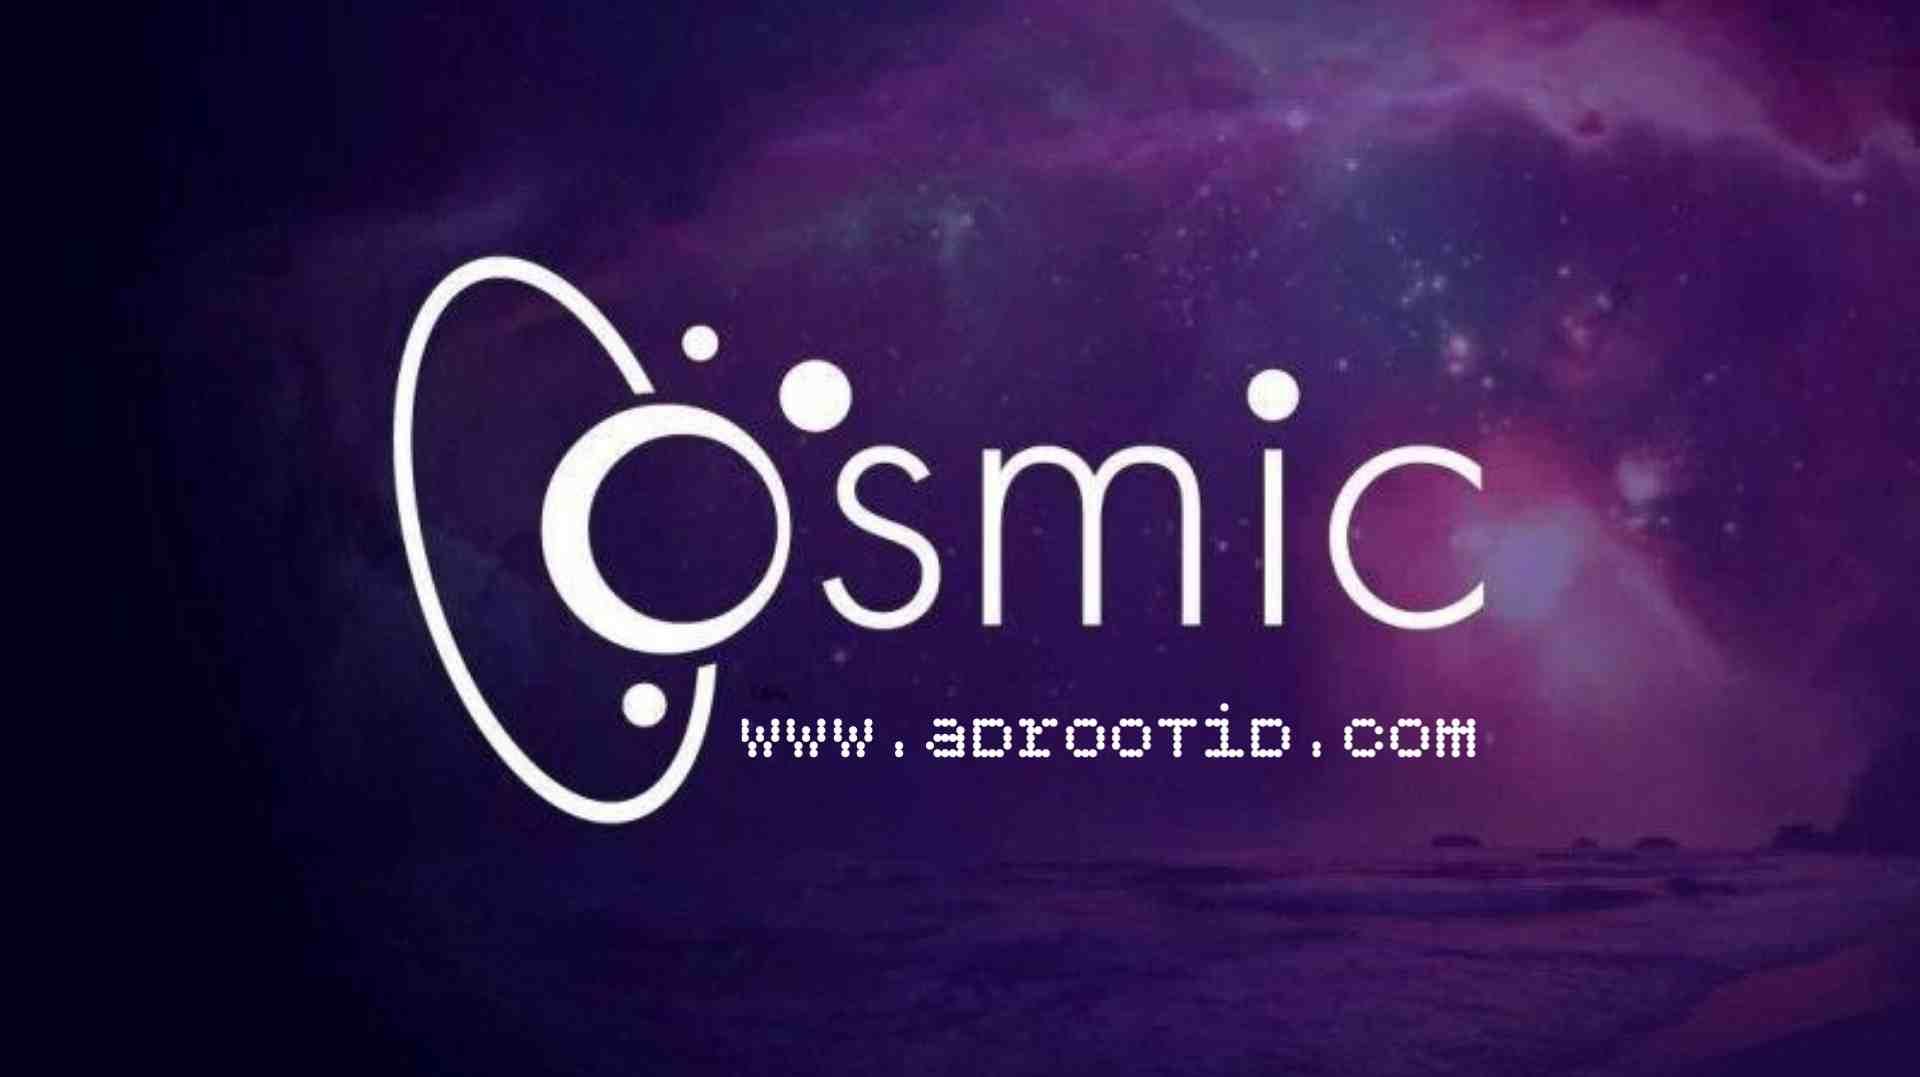 Cosmic Kernel v1 for Max M2 | X01AD